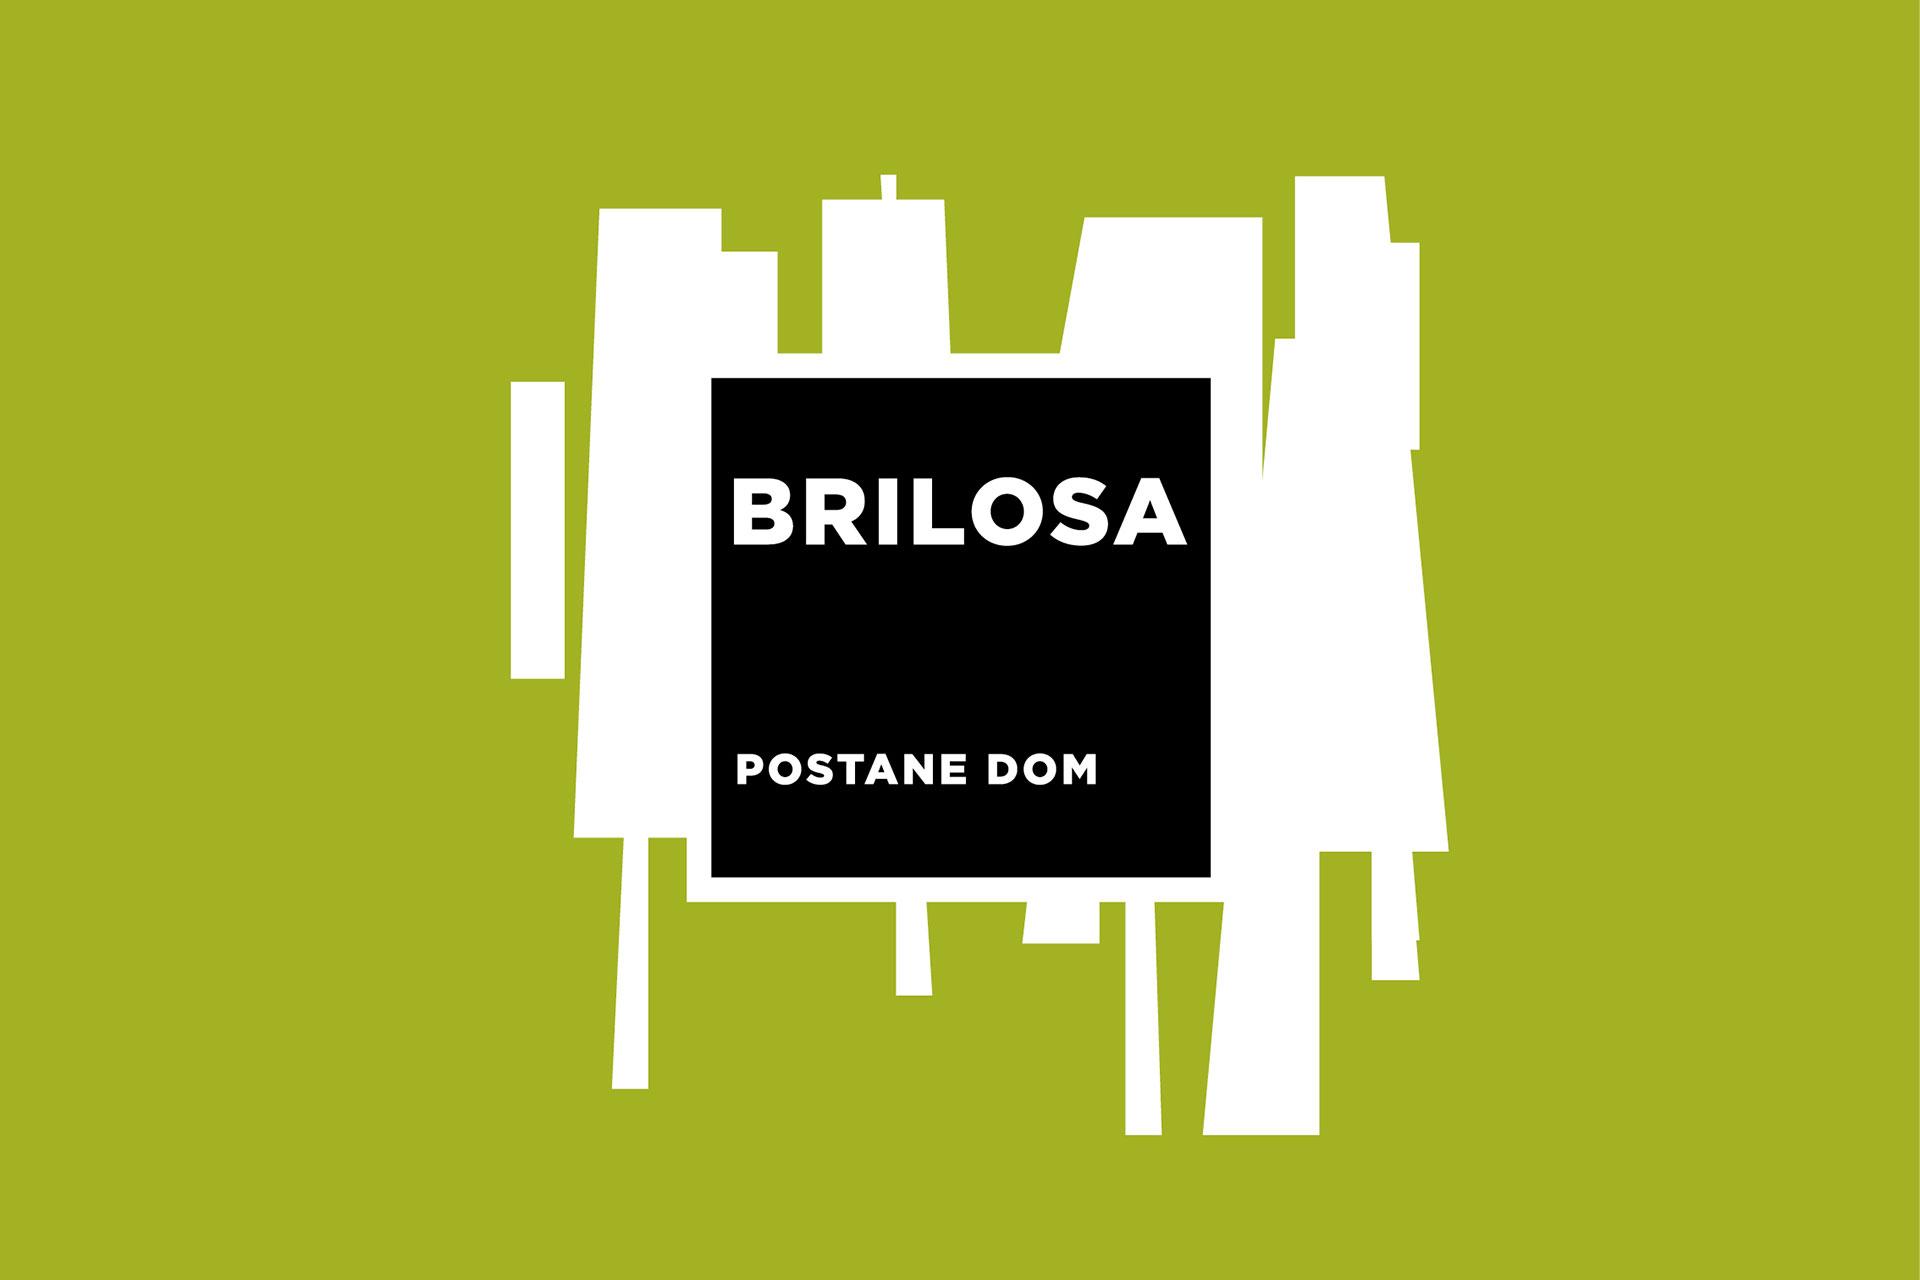 brilosa_marko-marinsek-studio-ma-ma_vizualna_vizualna_znak_2